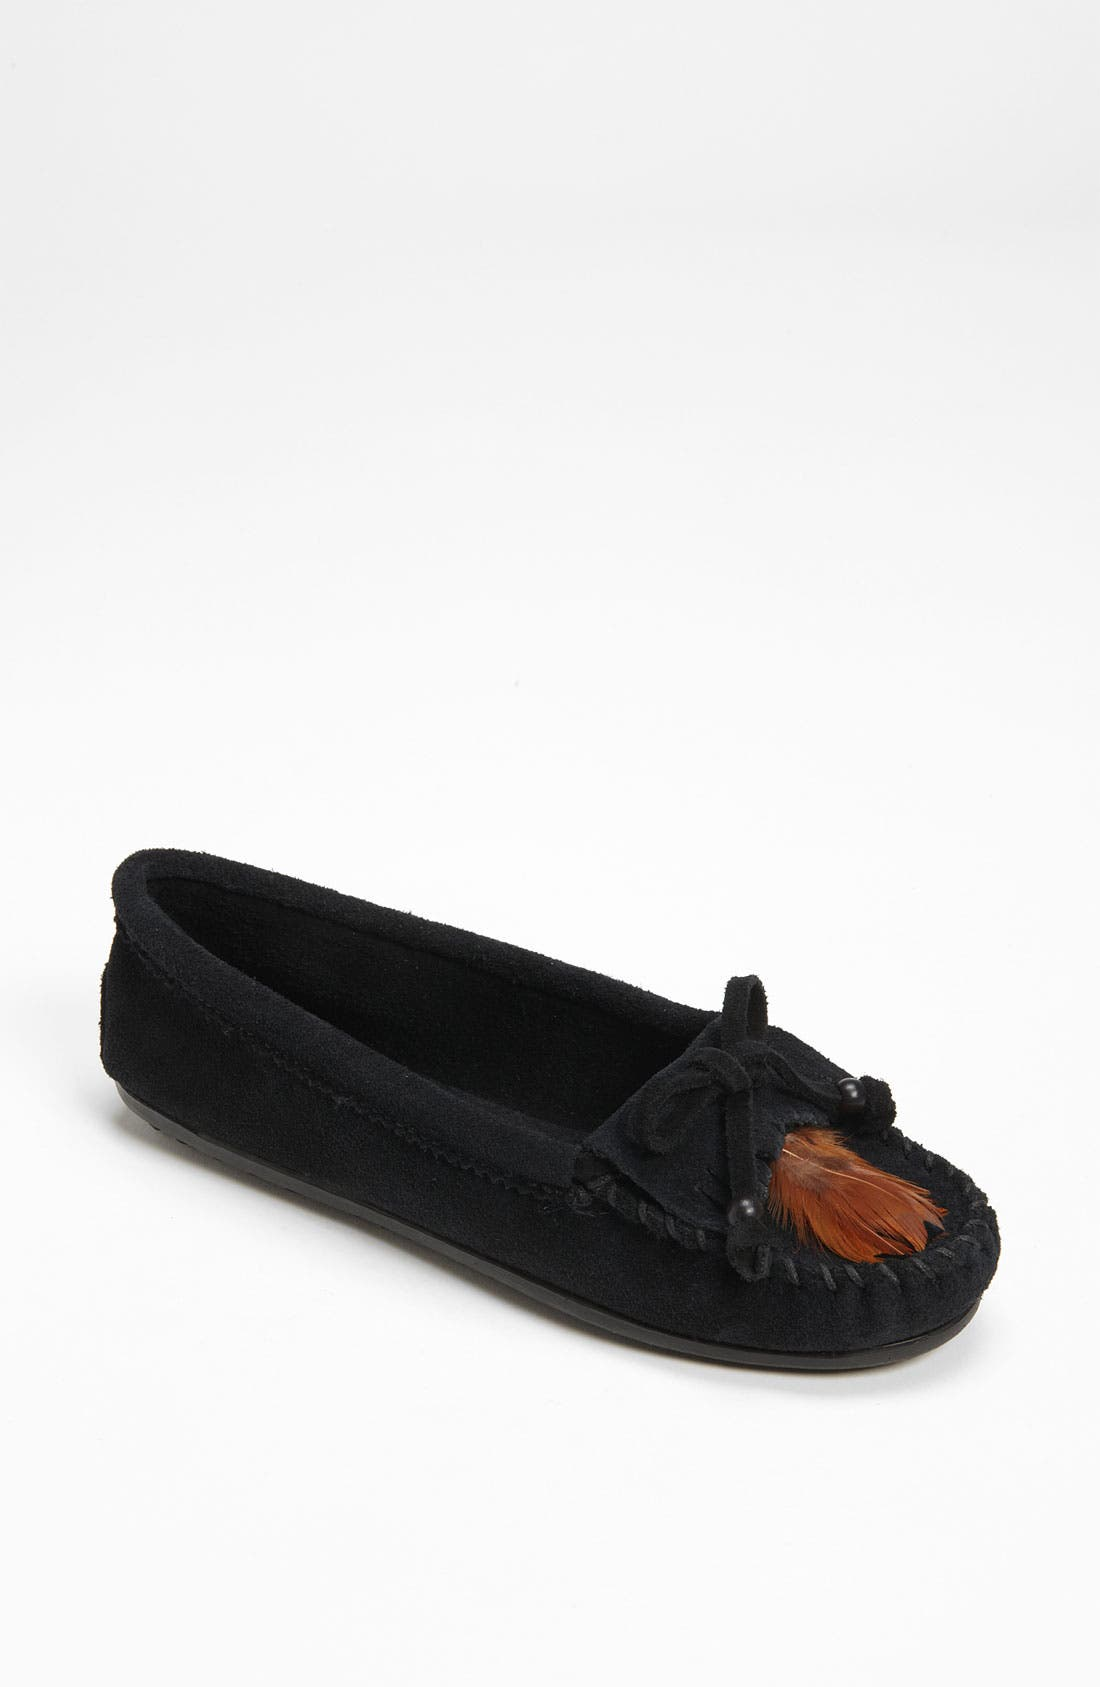 Main Image - Minnetonka 'Feather' Moccasin (Regular Retail Price: $48.95)